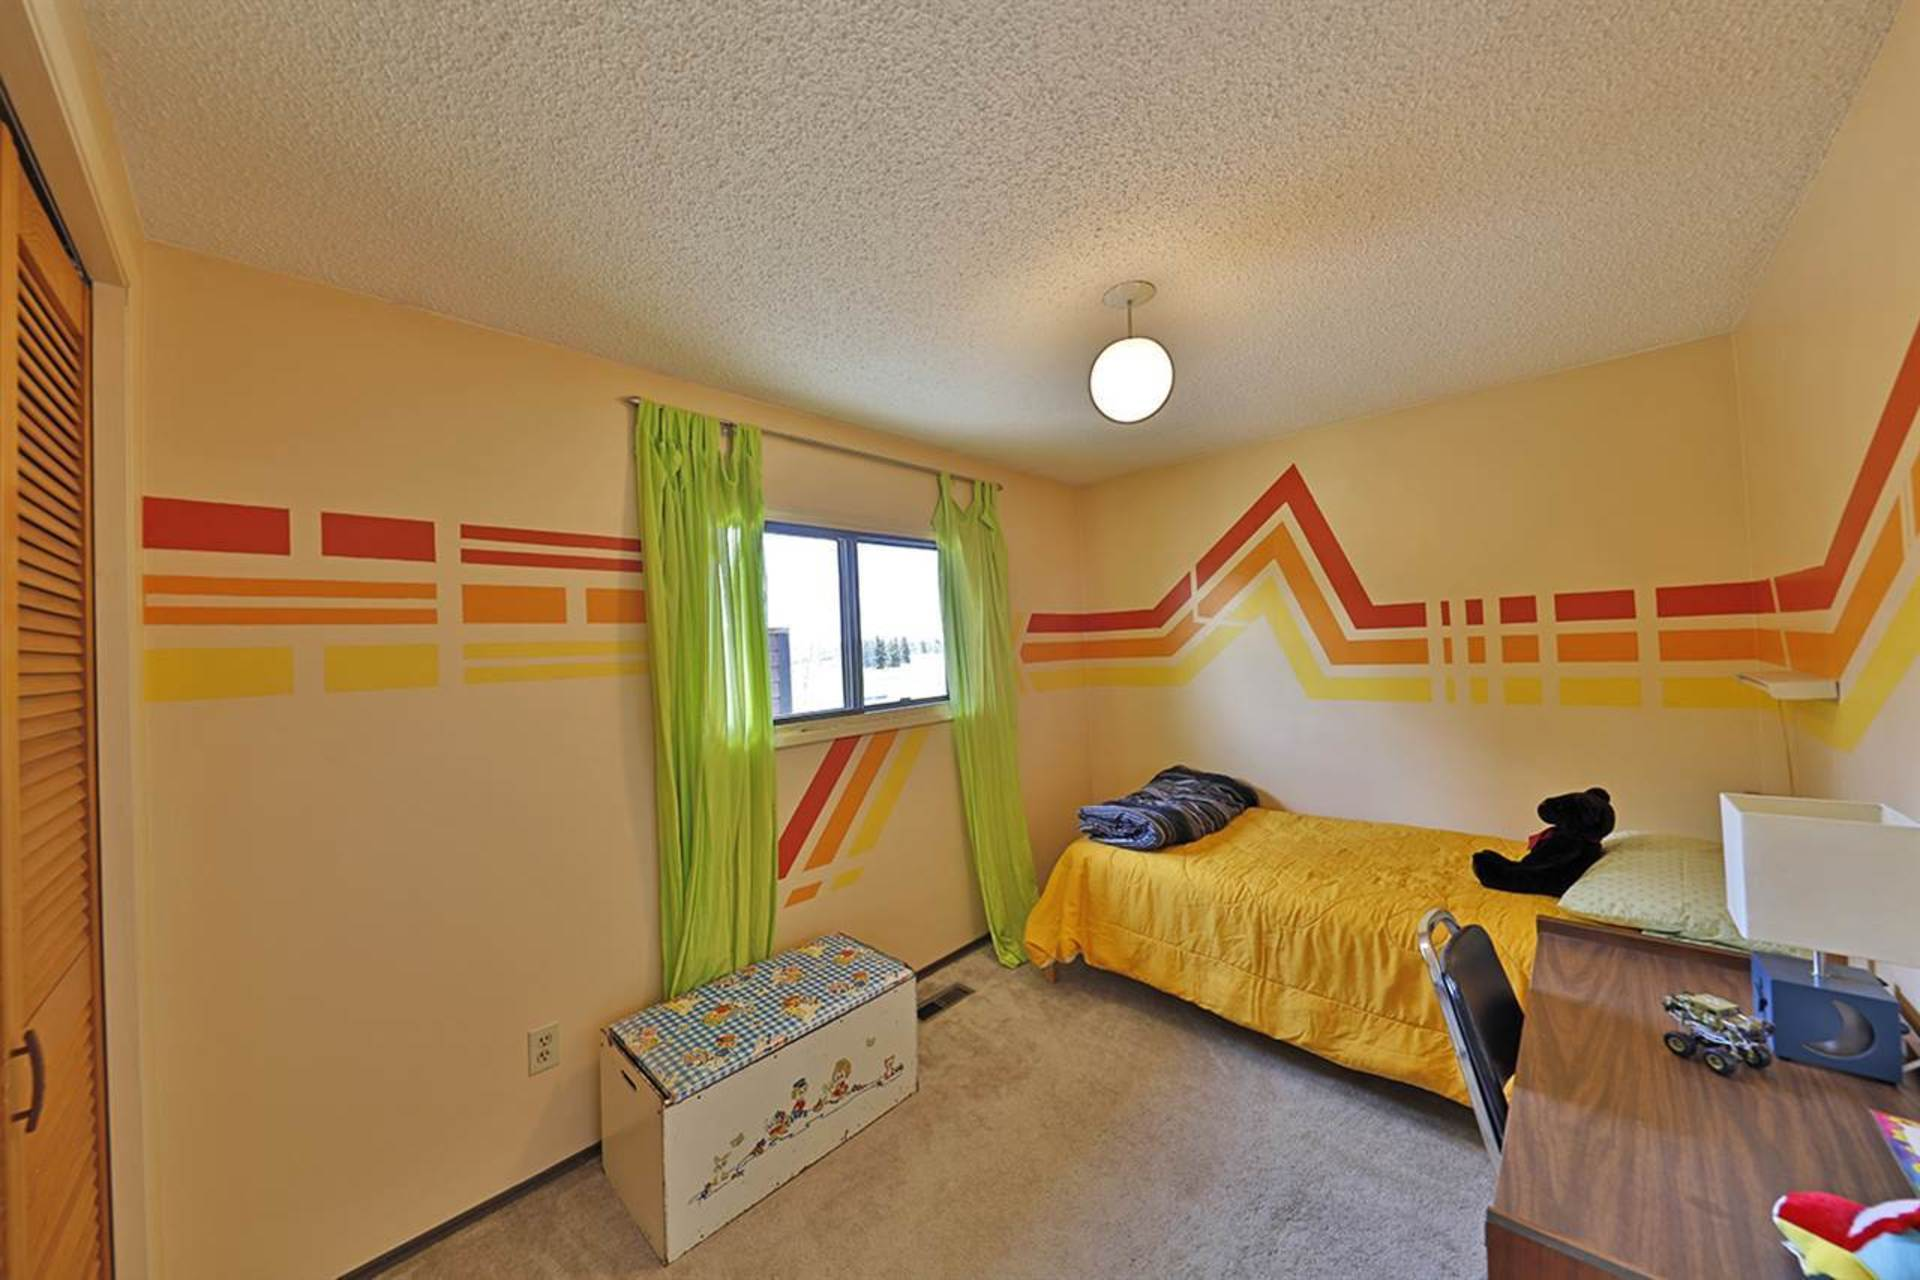 14111-117-street-carlisle-edmonton-13 at 14111 117 Street, Carlisle, Edmonton